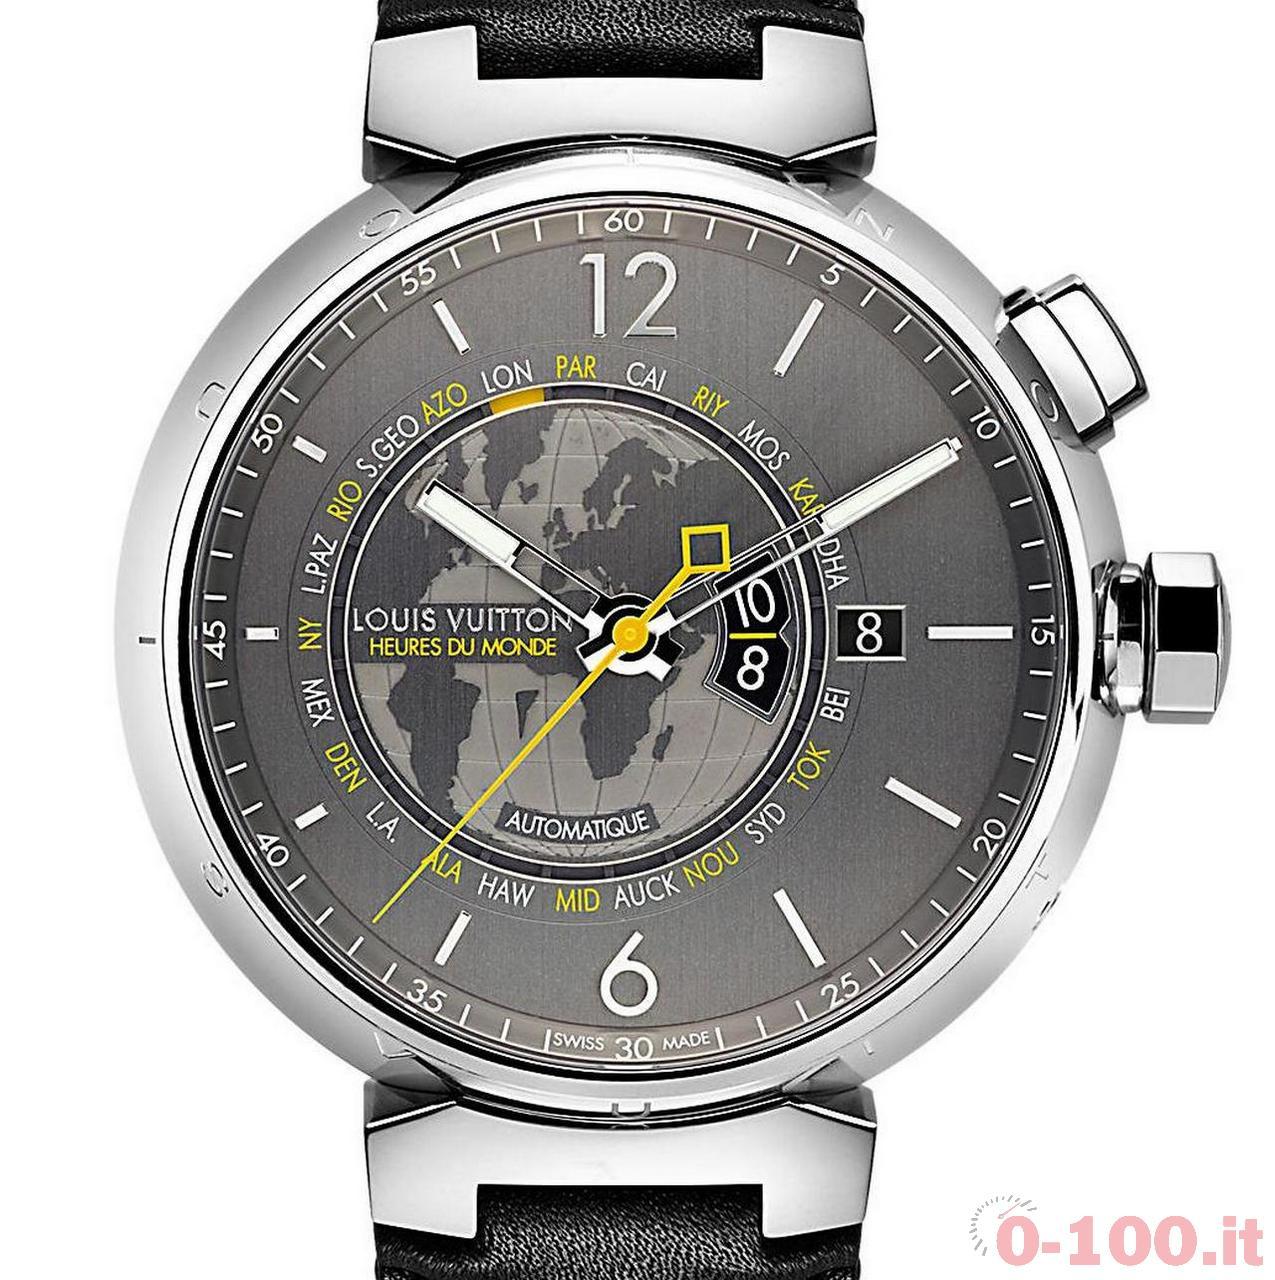 louis-vuitton-tambour-heures-du-monde-gmt-prezzo-price-0-100_2